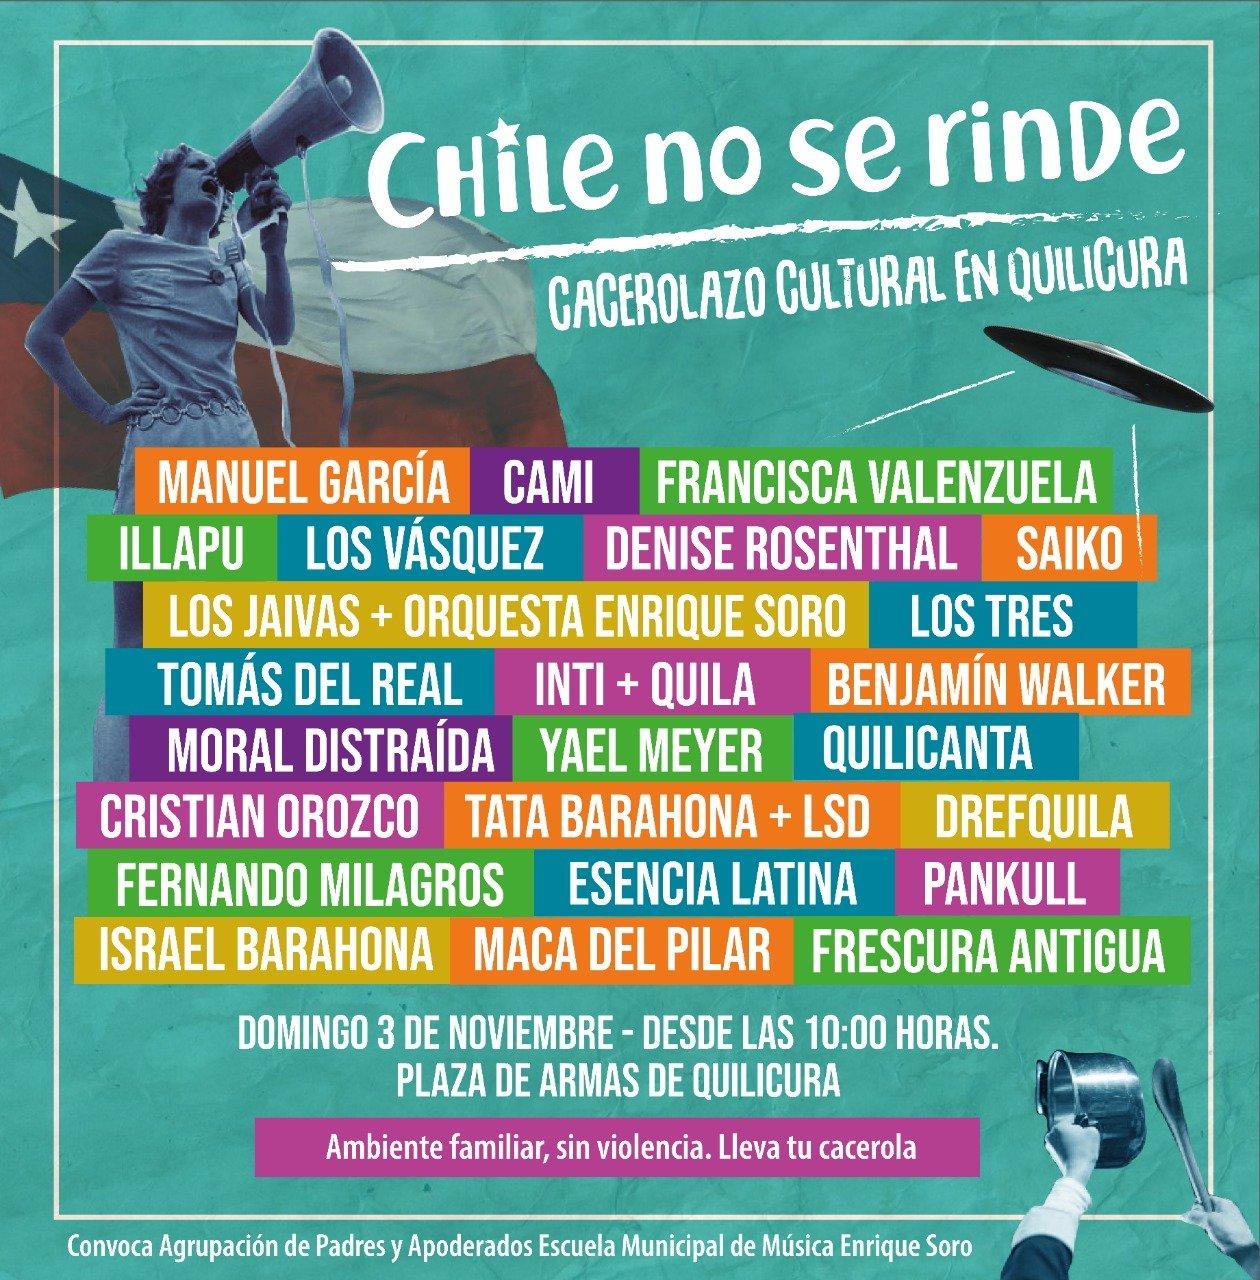 Afiche promocional Chile no se rinde